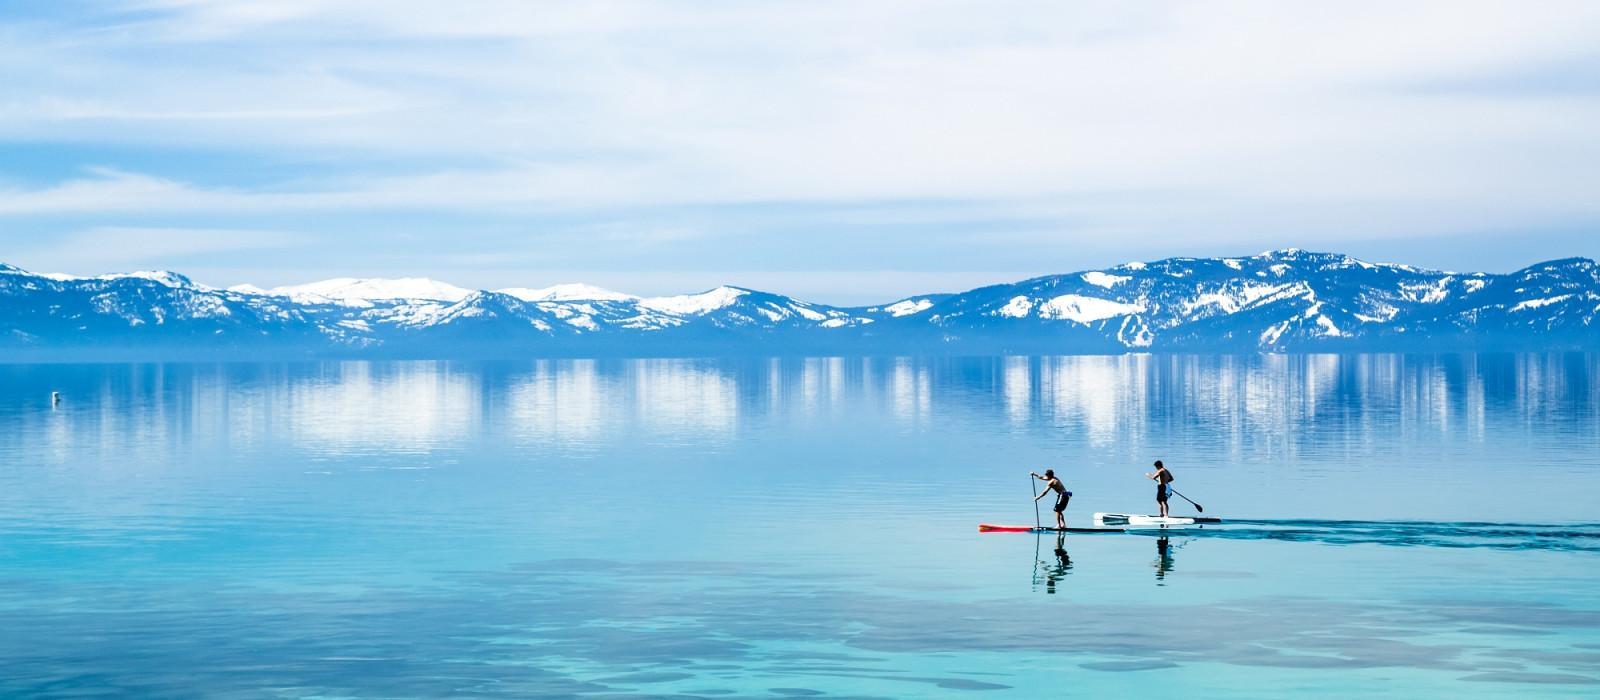 Destination Lake Tahoe USA